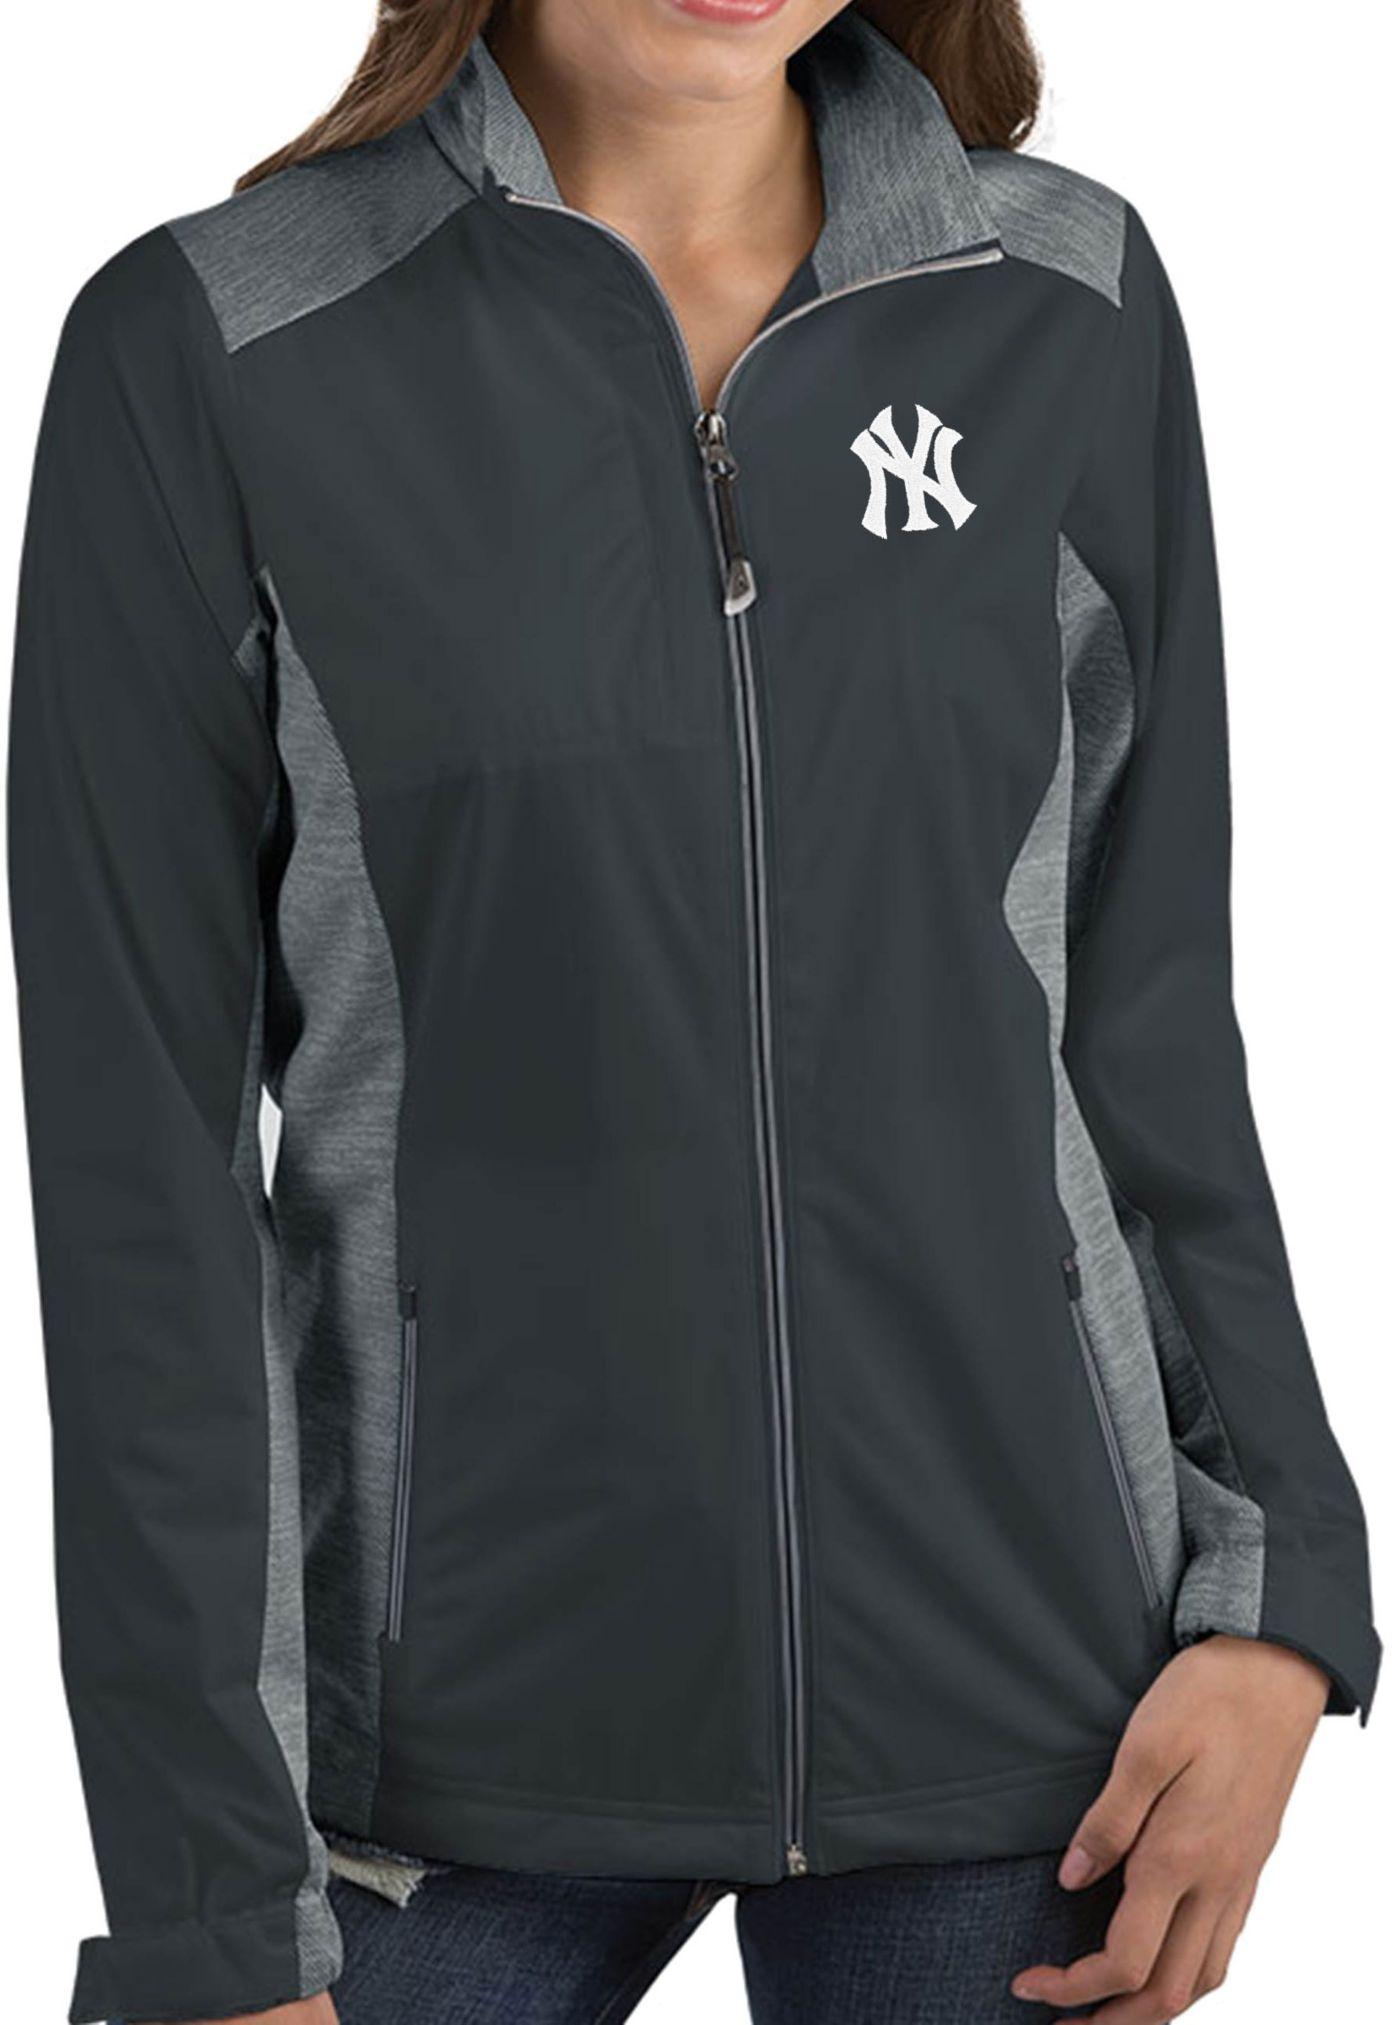 Antigua Women's New York Yankees Revolve Grey Full-Zip Jacket